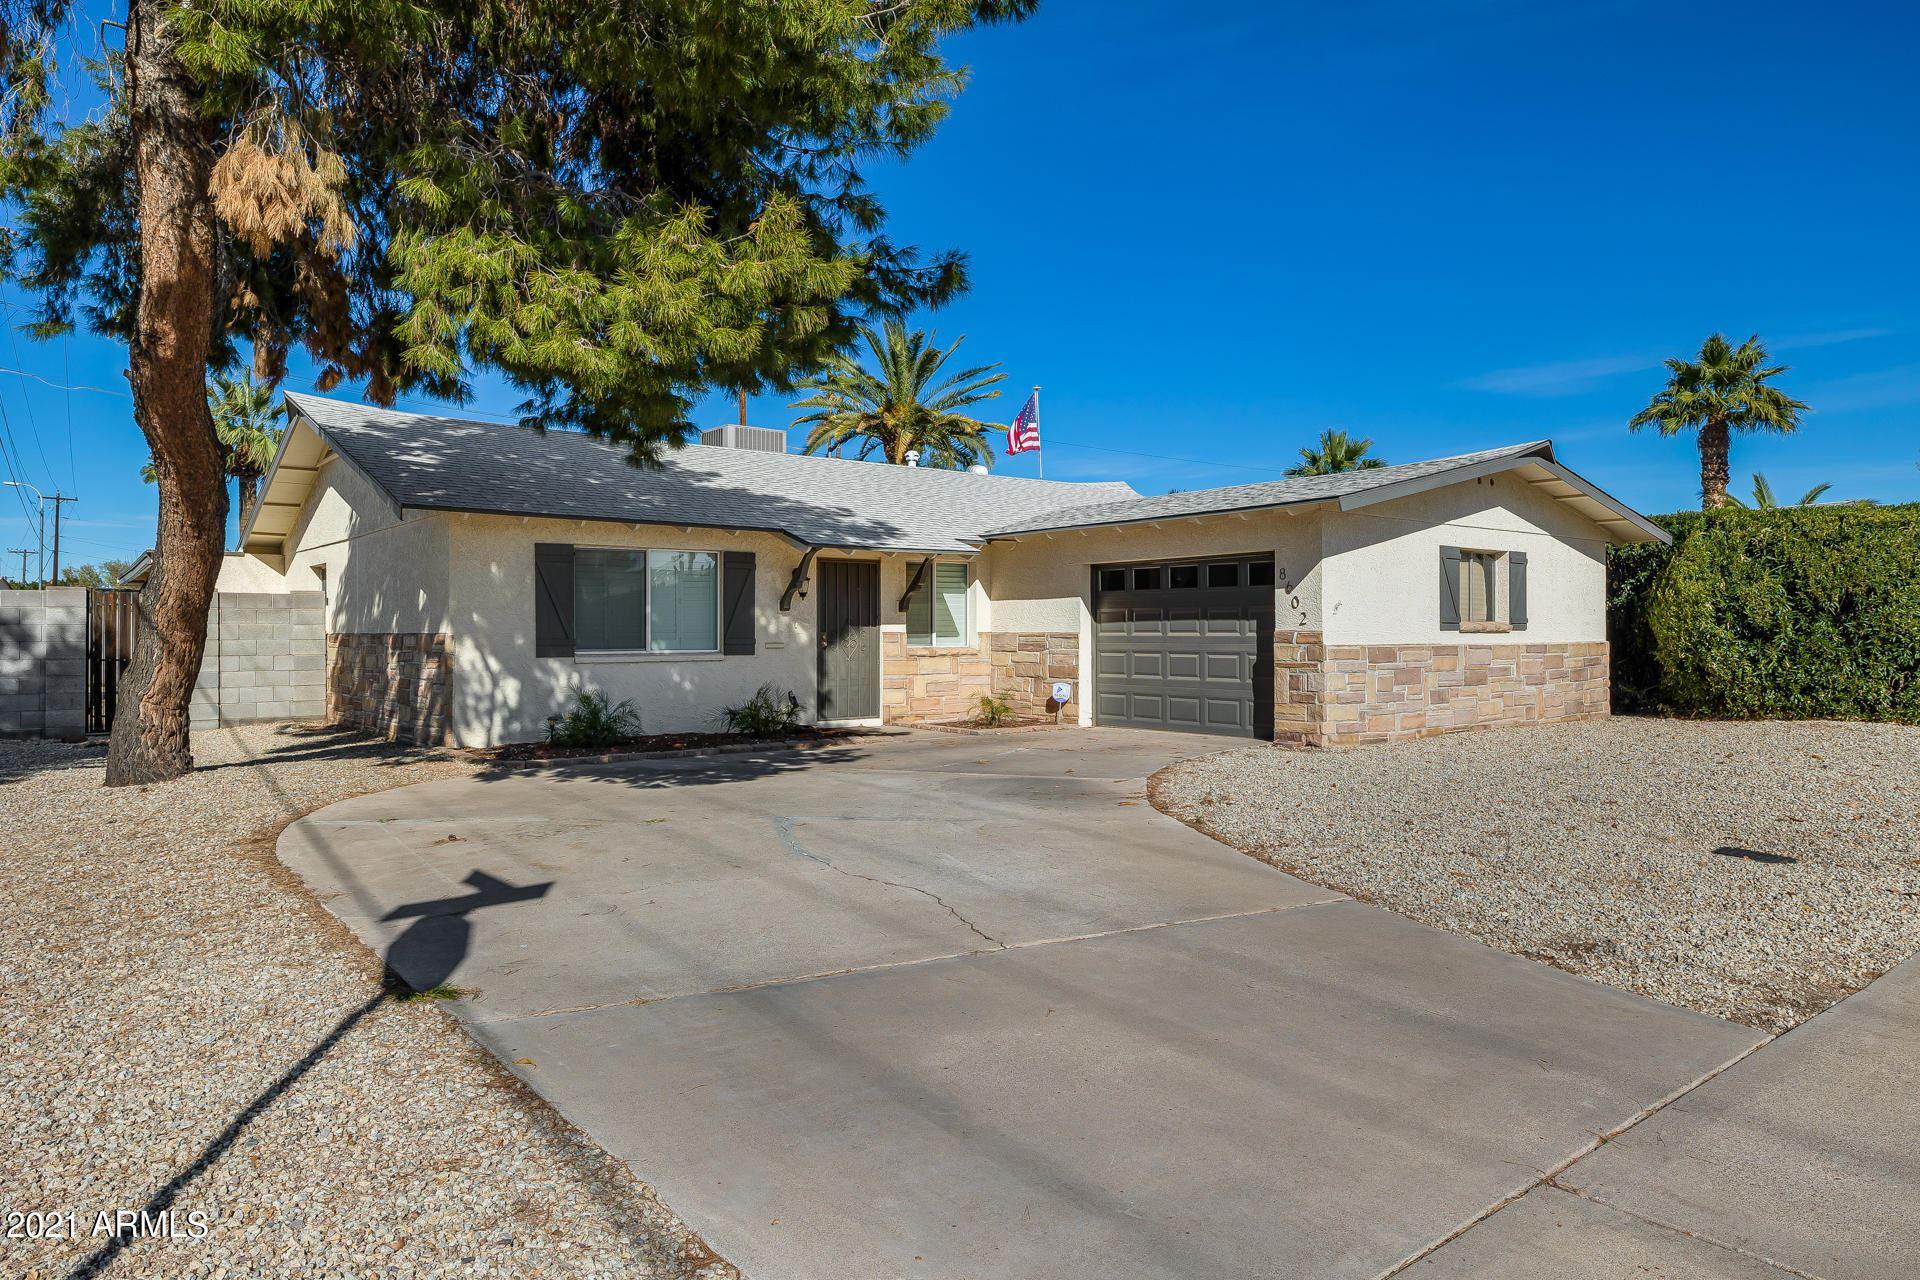 8602 E STARLIGHT Way, Scottsdale, AZ 85250 - MLS#: 6185010